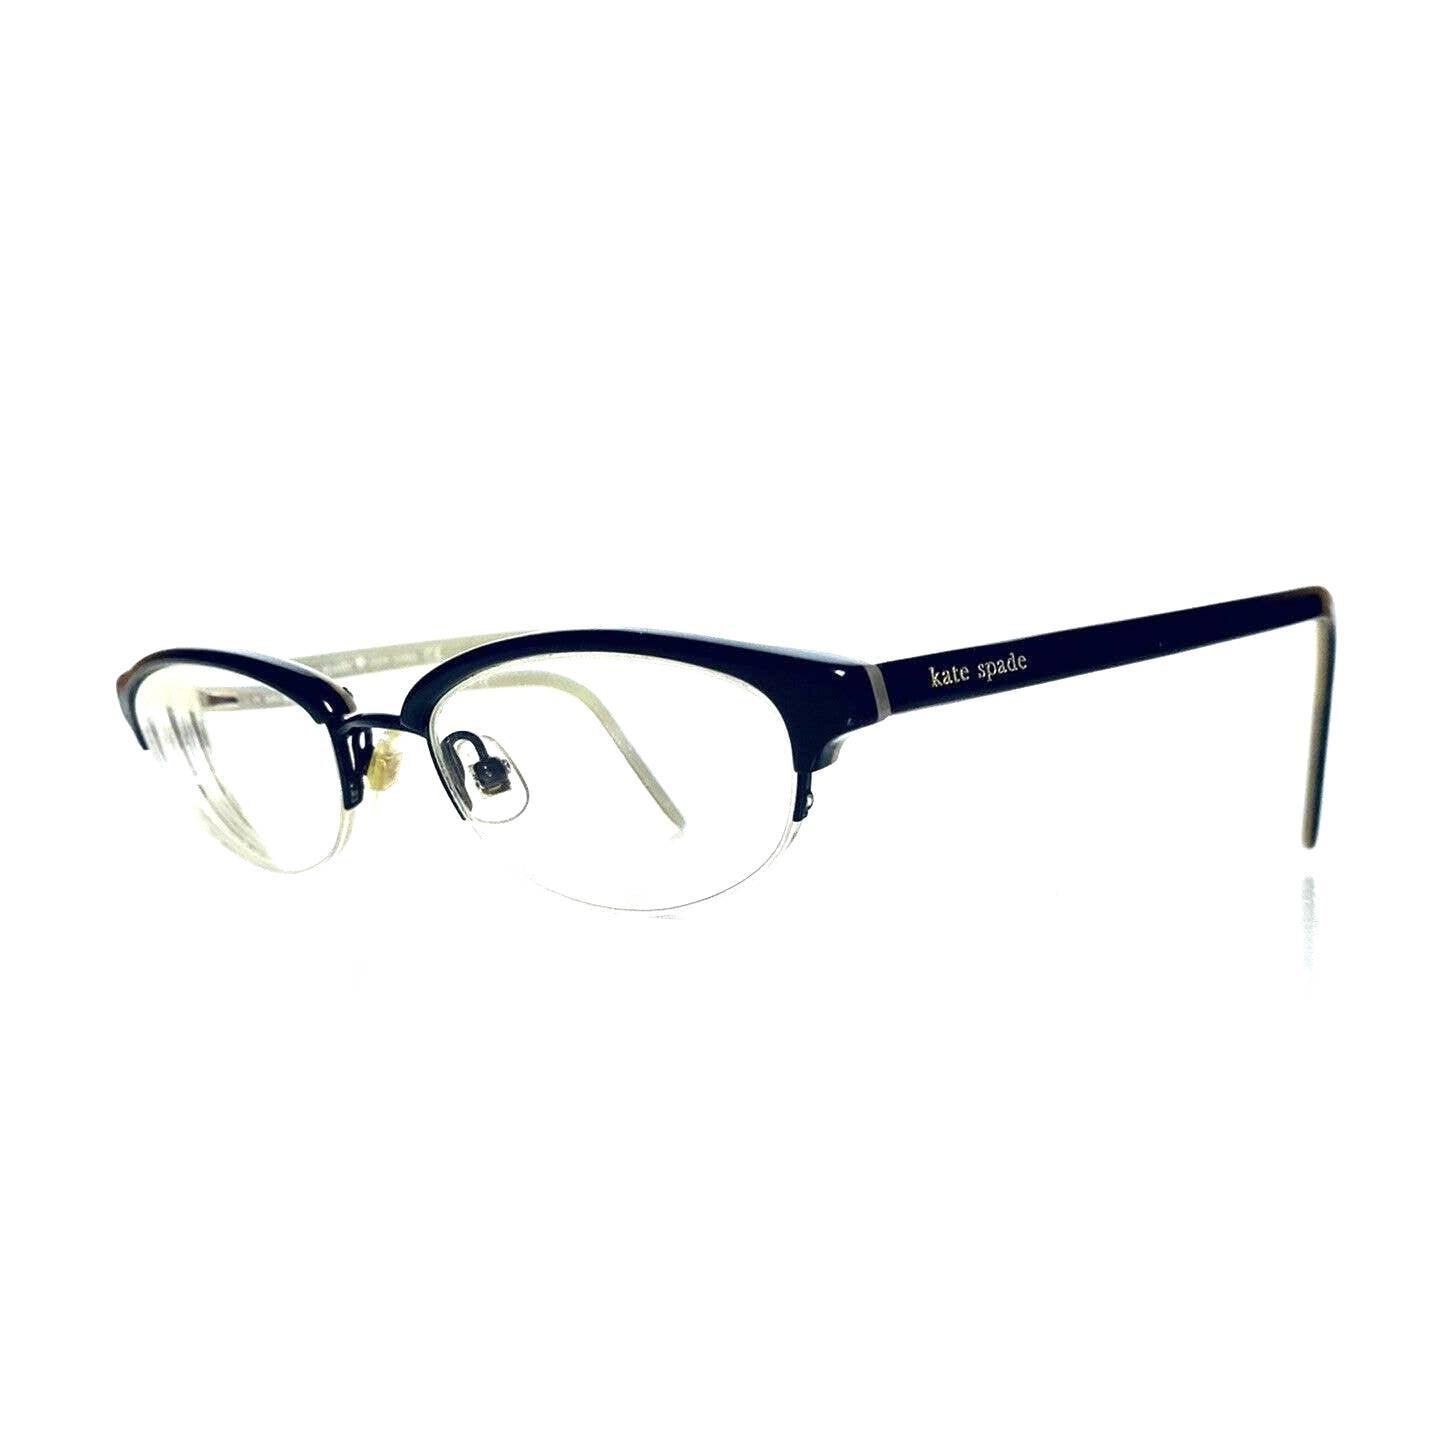 Kate Spade Black Frame Glasses